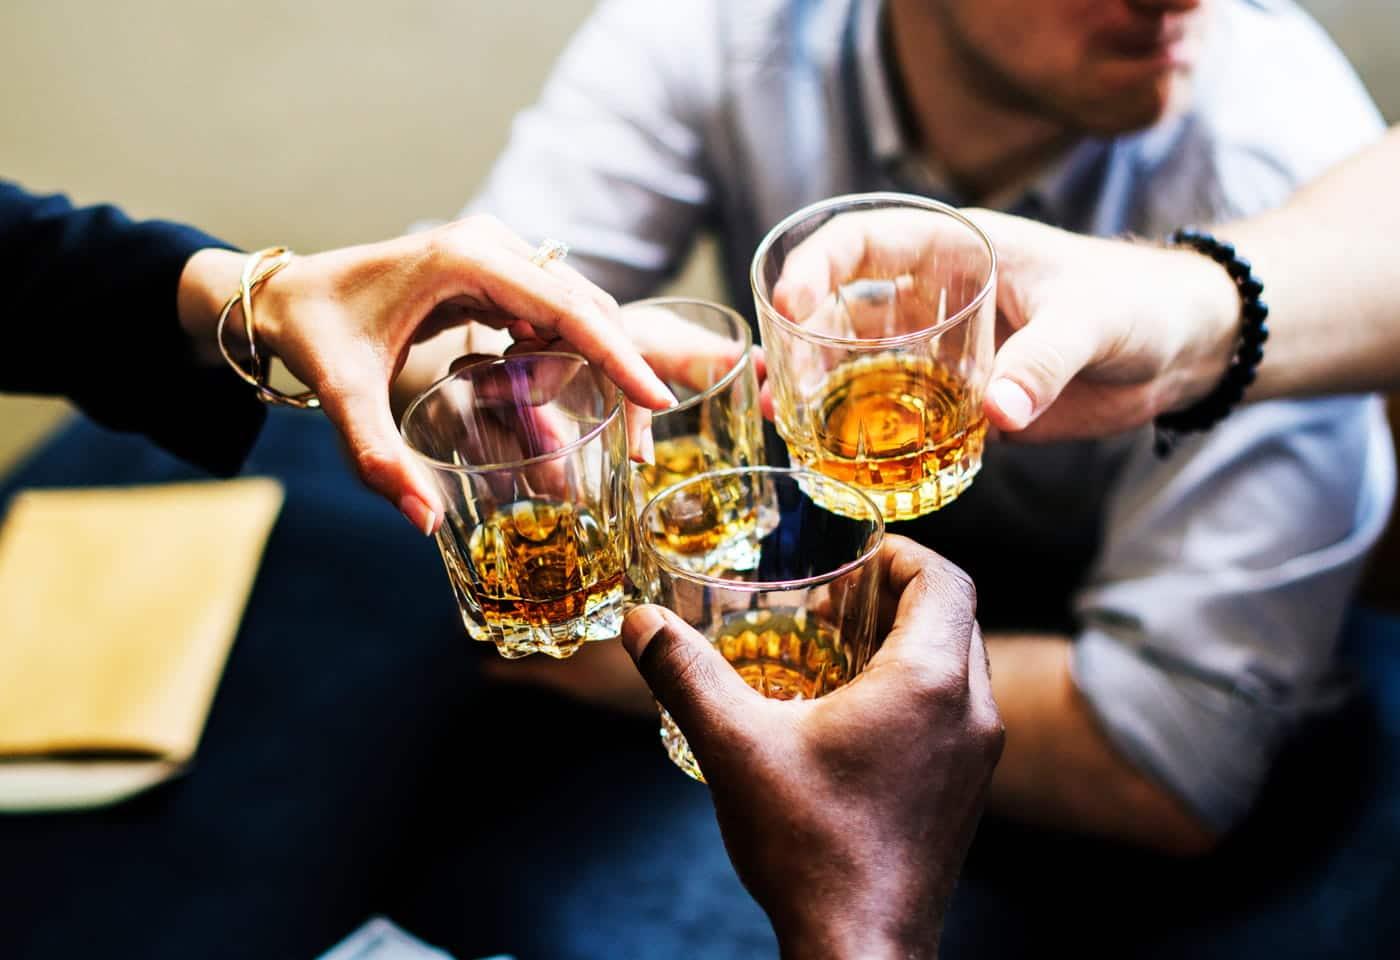 Dé whisky proeverij in Zuid-Limburg die je niet mag missen!